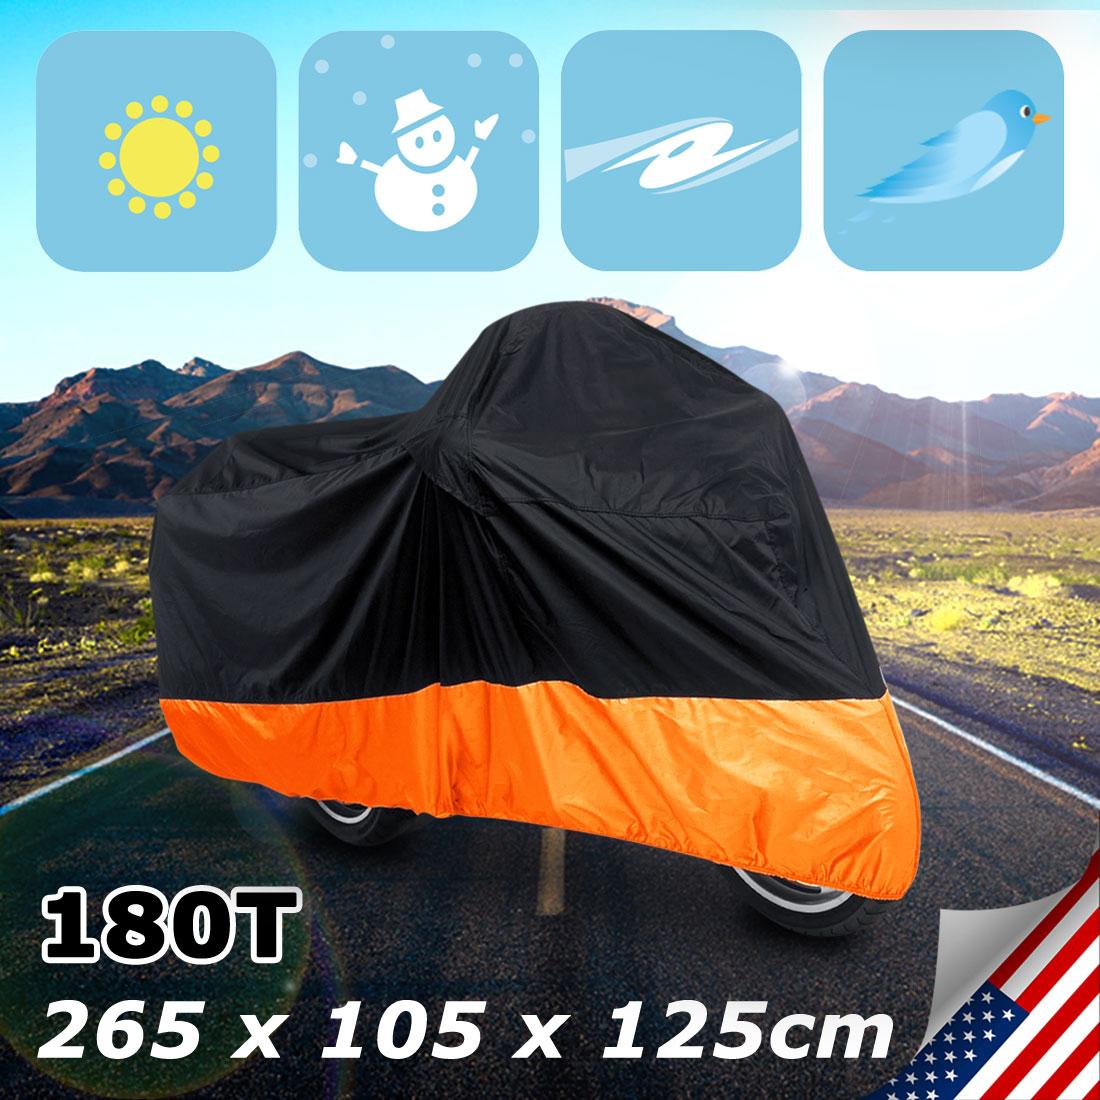 UXCELL Xxl 180T Rain Dust Motorcycle Cover Black+Orange Outdoor Waterproof Uv Protector